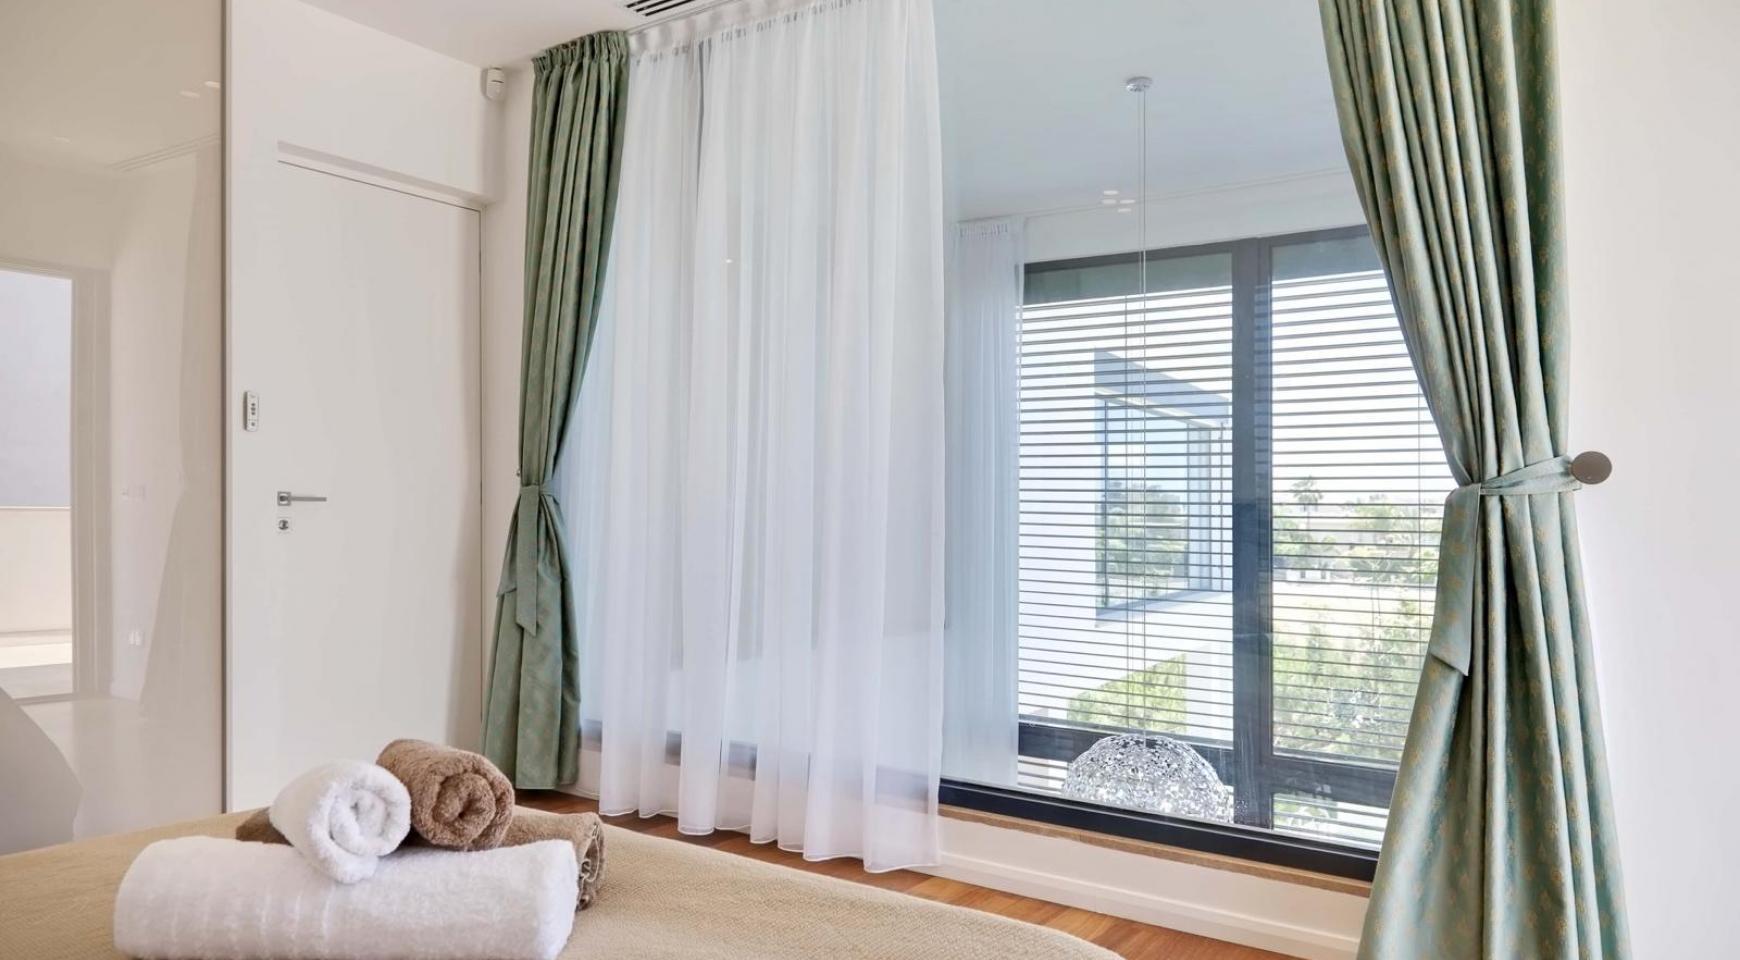 New Luxurious 4 Bedroom Villa in the Tourist Area - 37